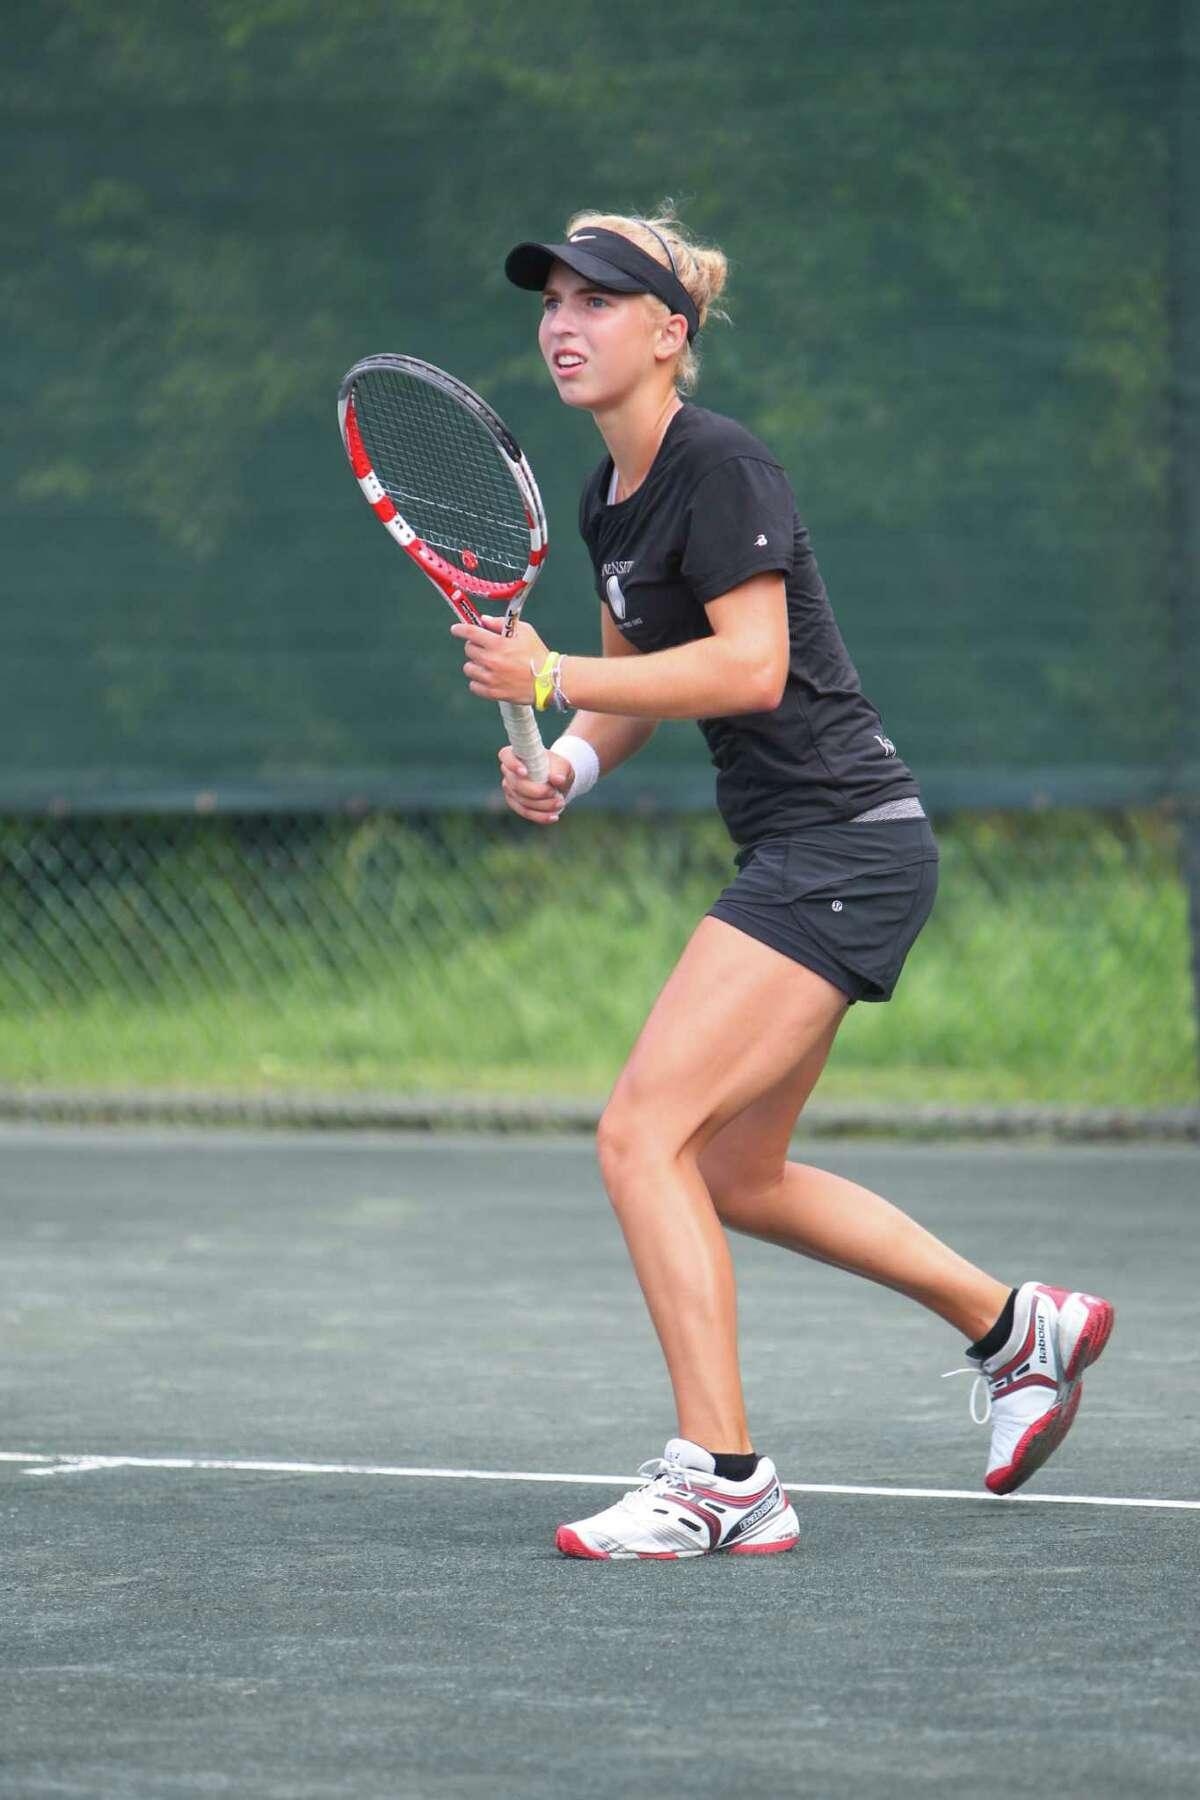 Photo By David Kenas- Fairfielder Ellyse Hamlin prepares to return a shot during a 2012 match.